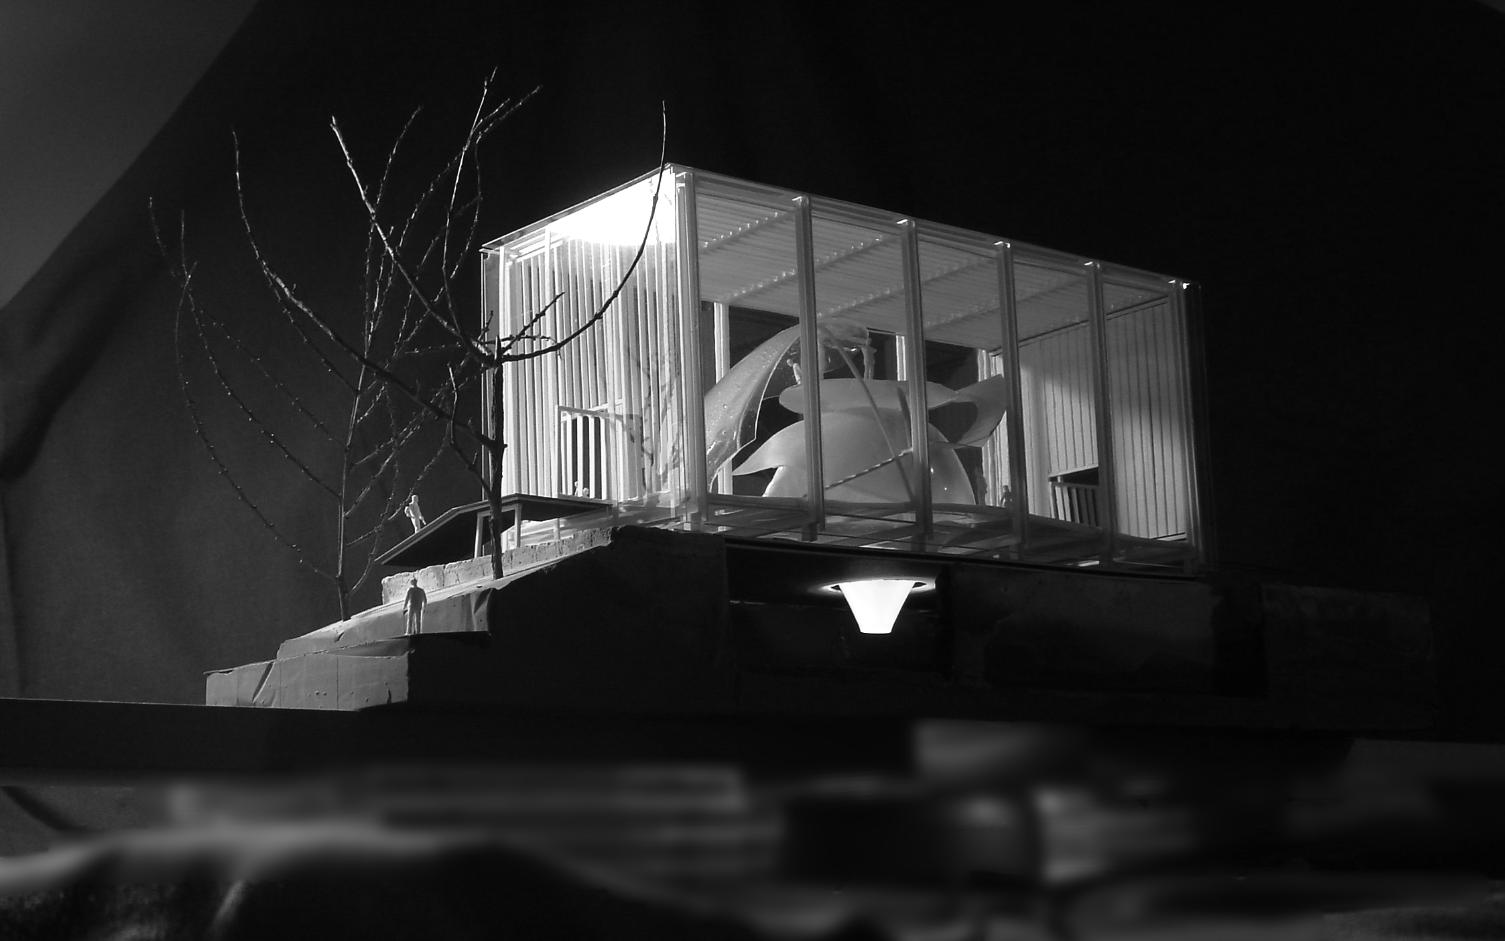 jurado-architects-composites-7.1.png